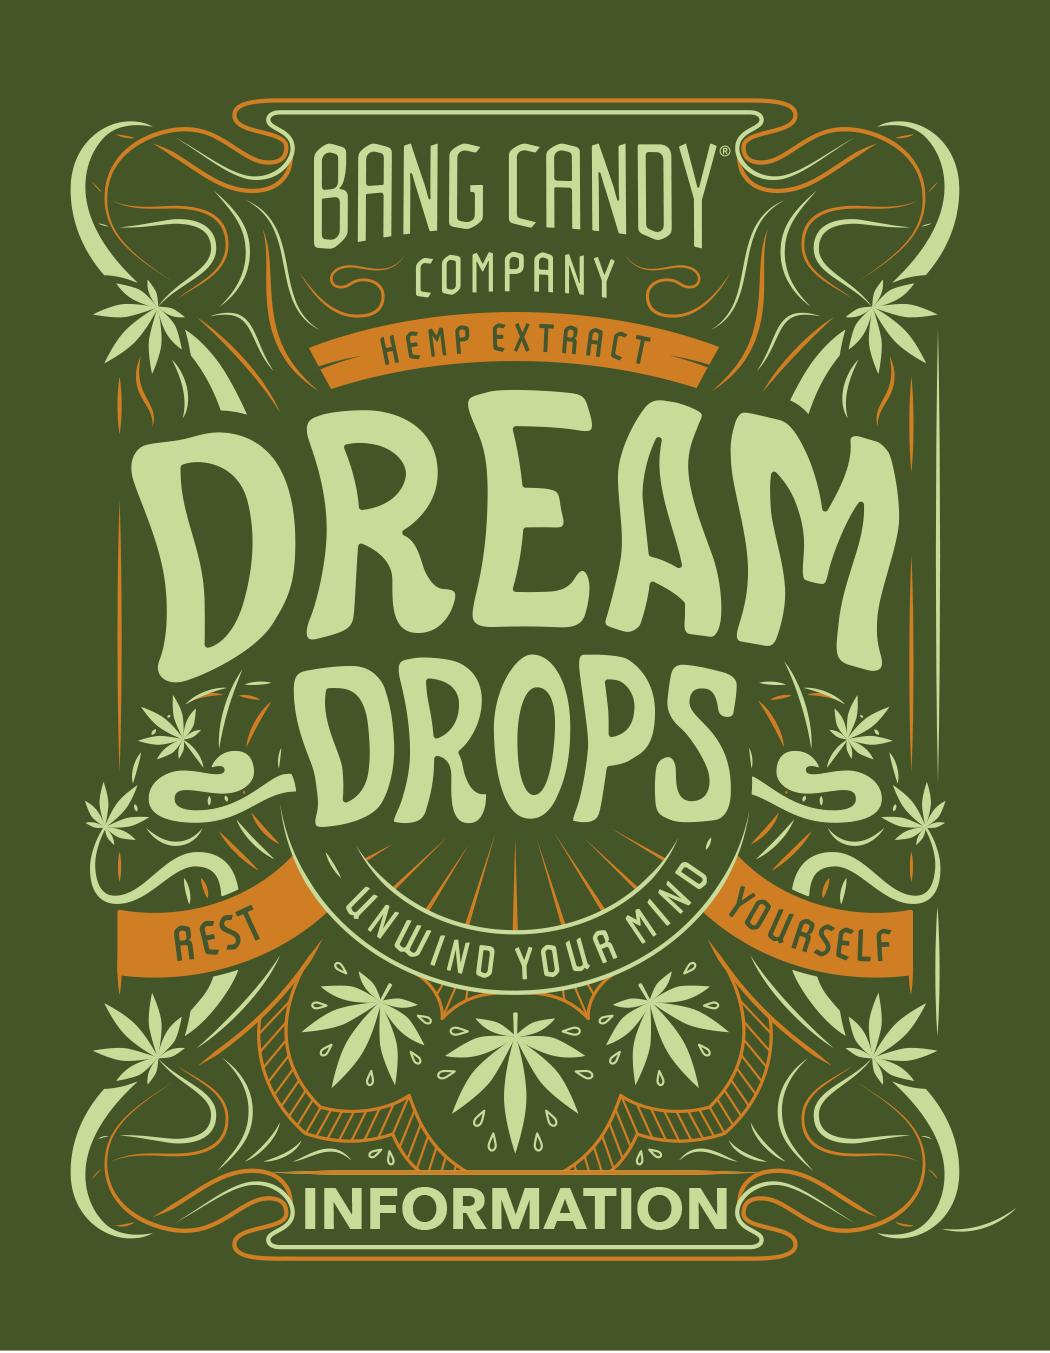 CBD Dream Drops Artwork